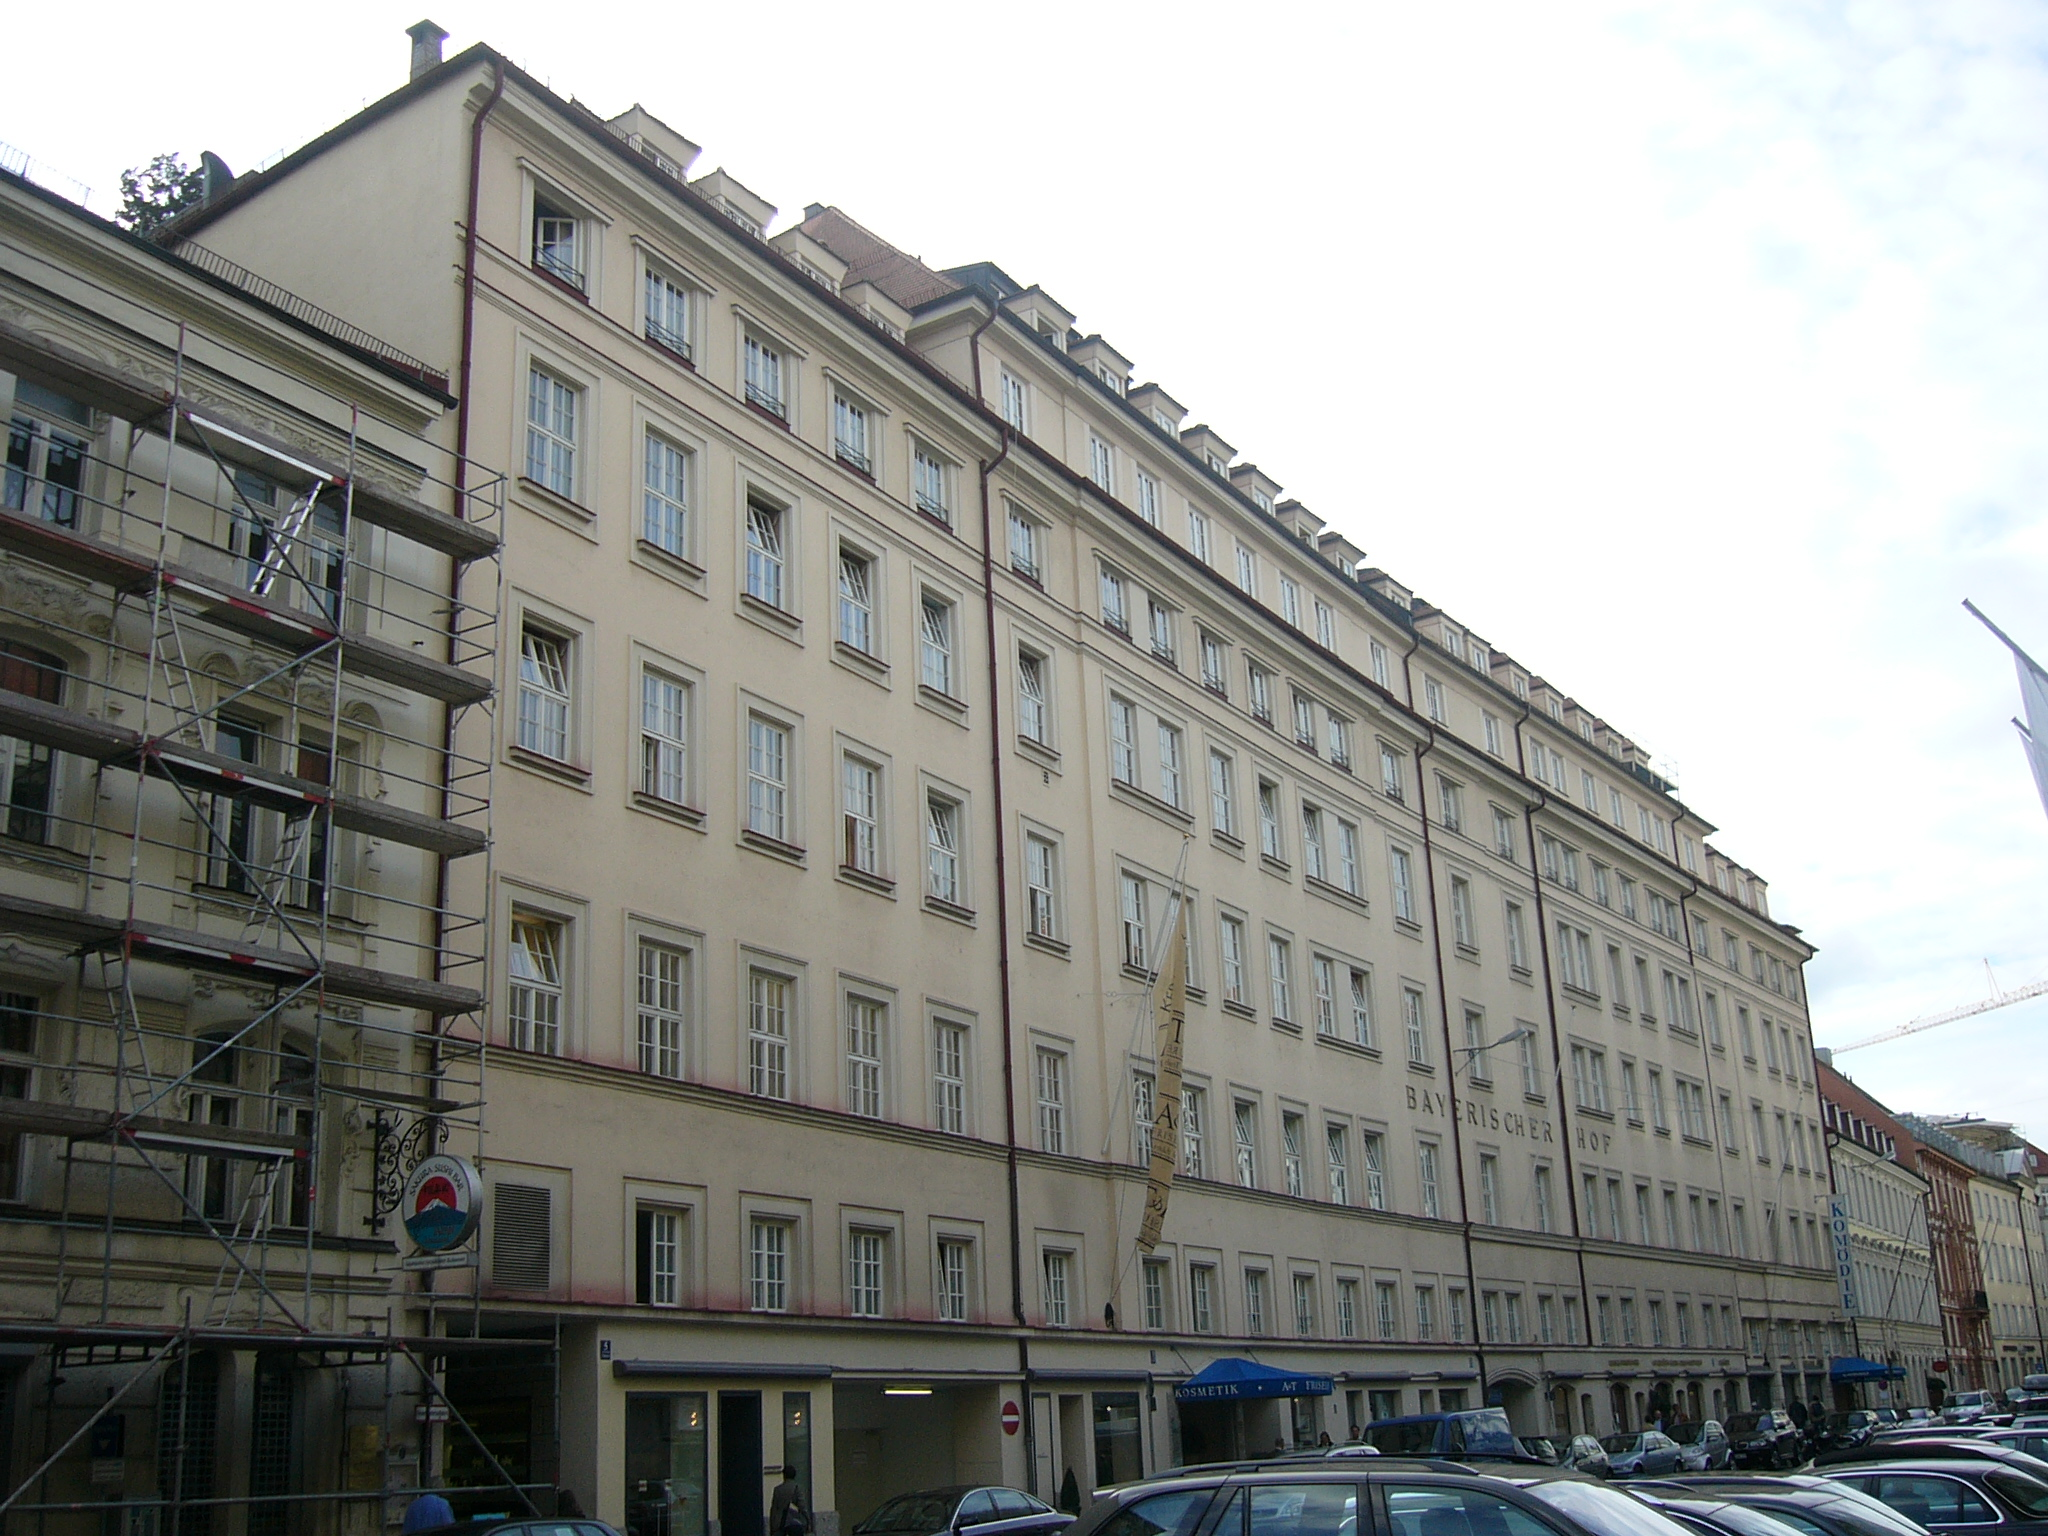 Hotel Bayerischer Hof Bad Fubing Doppelzimmer